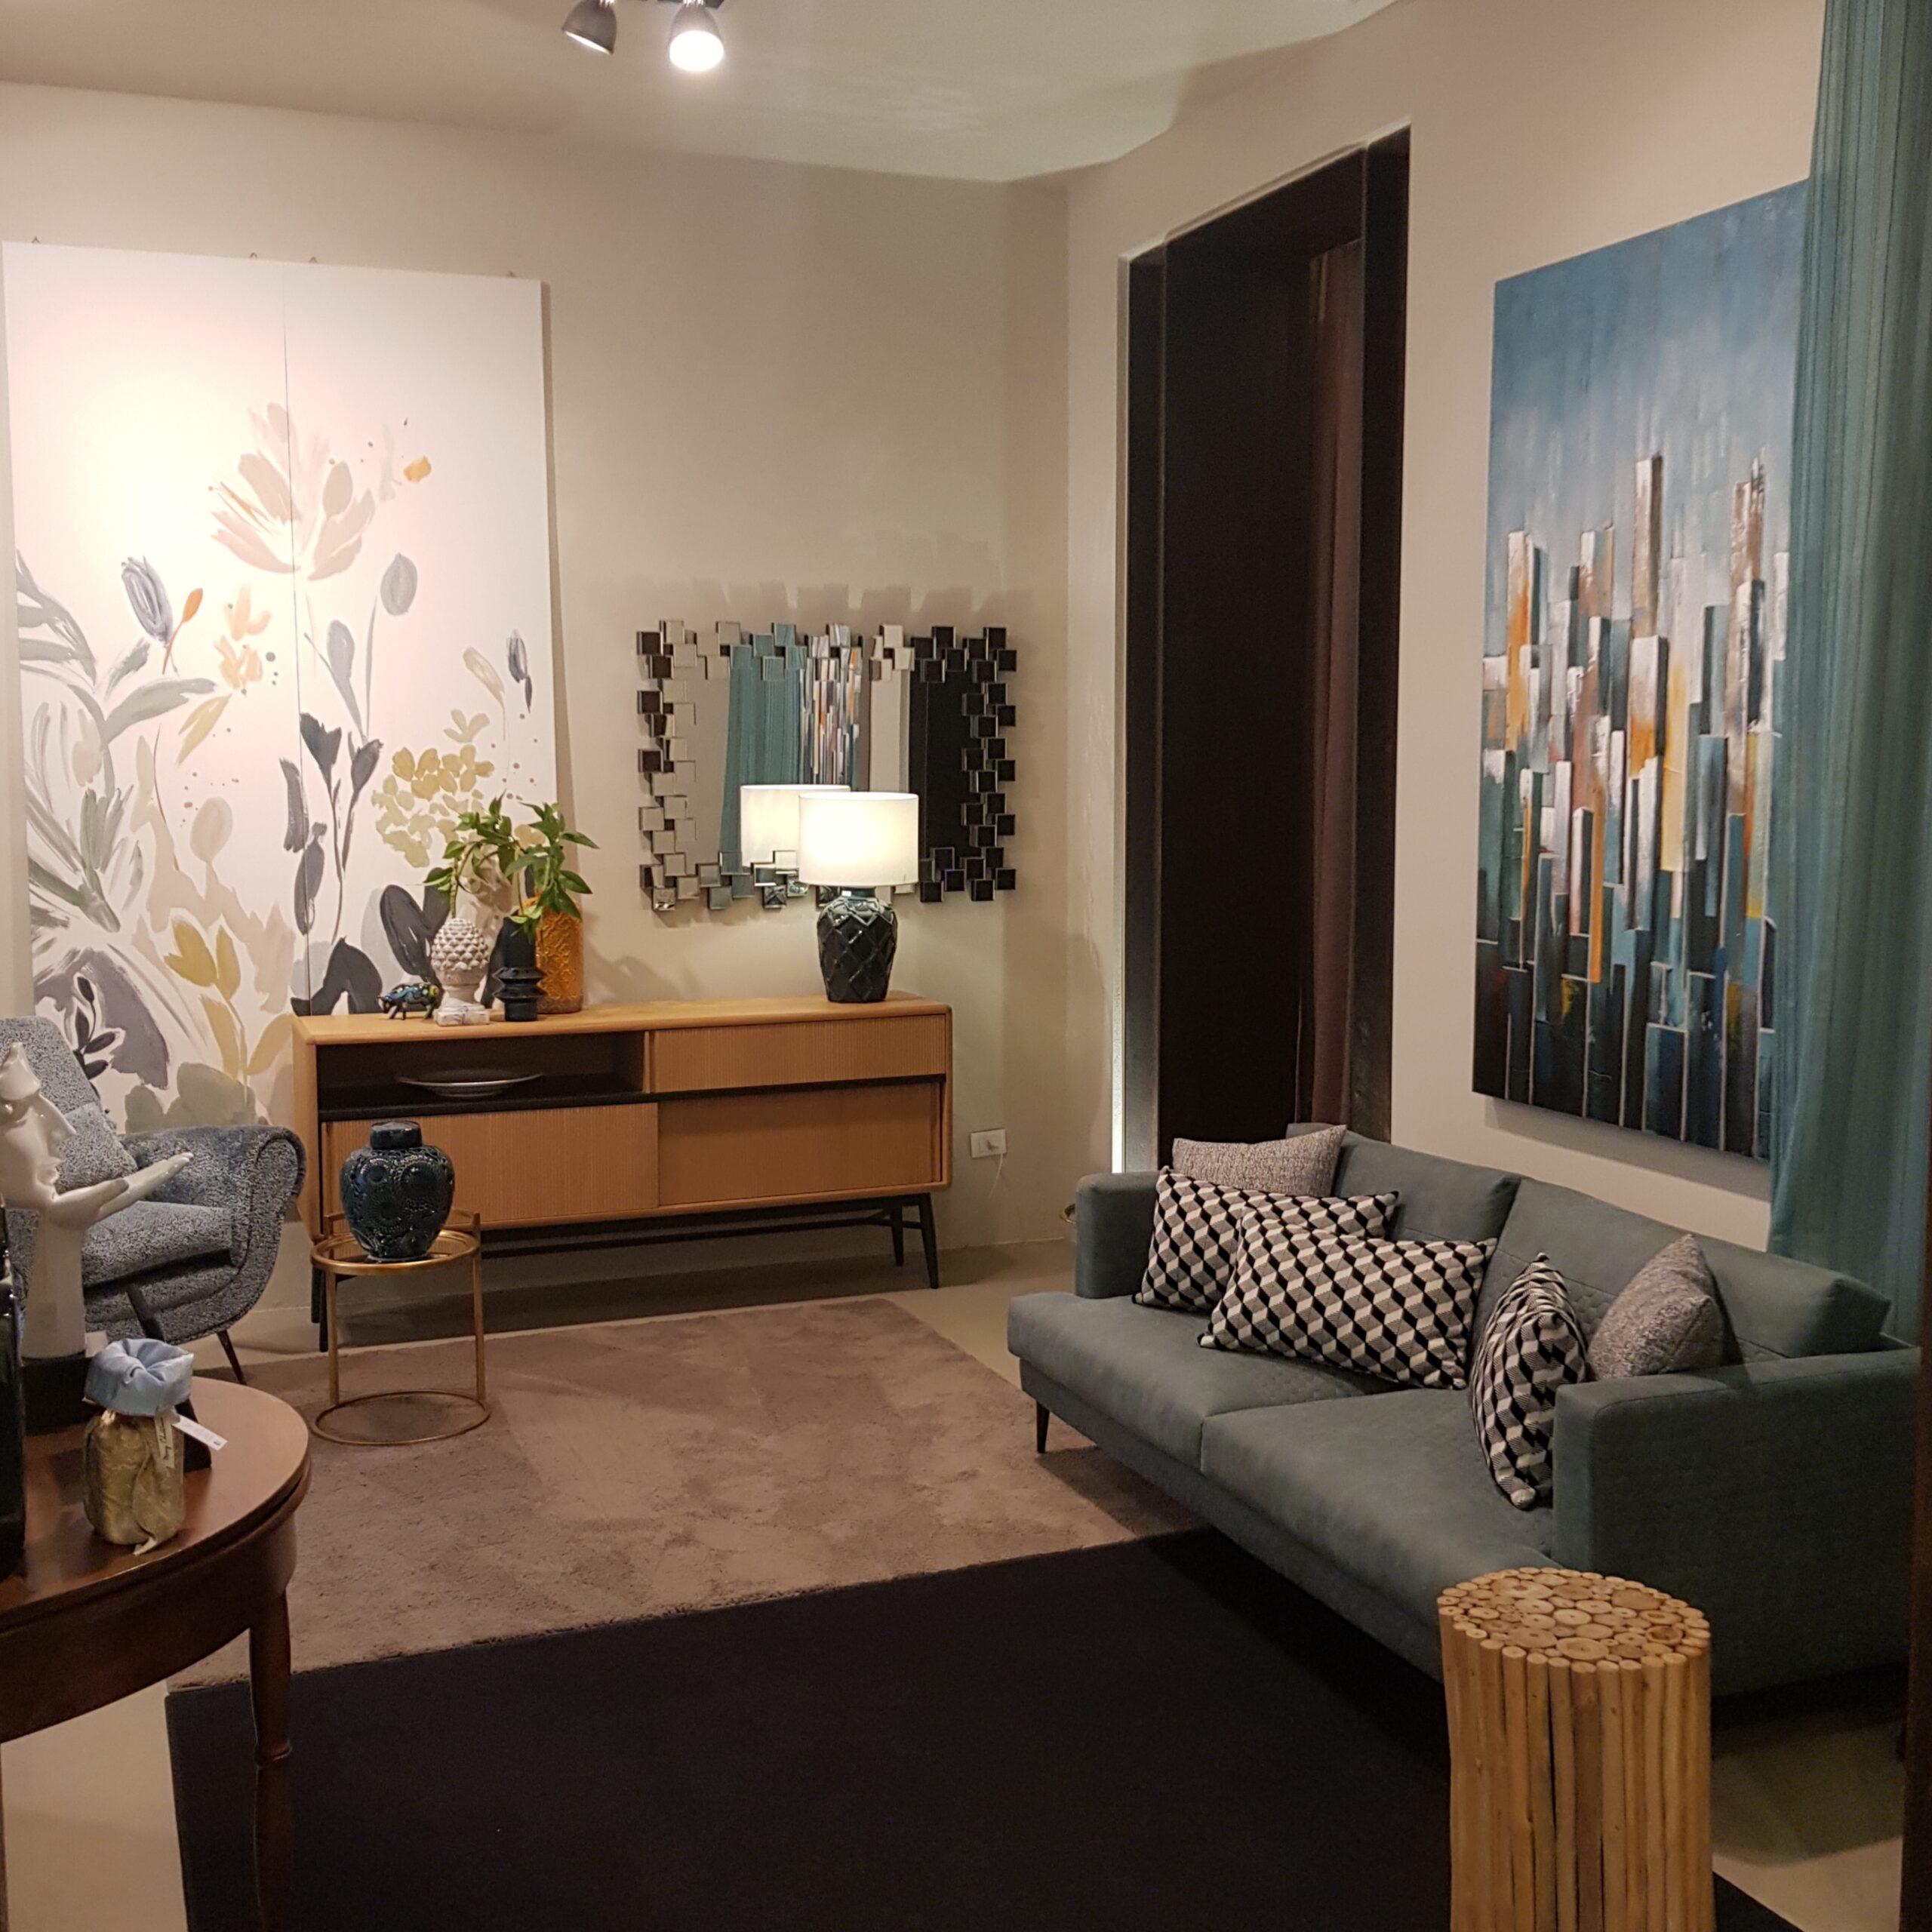 VIBO_showroom_feb 2021_11